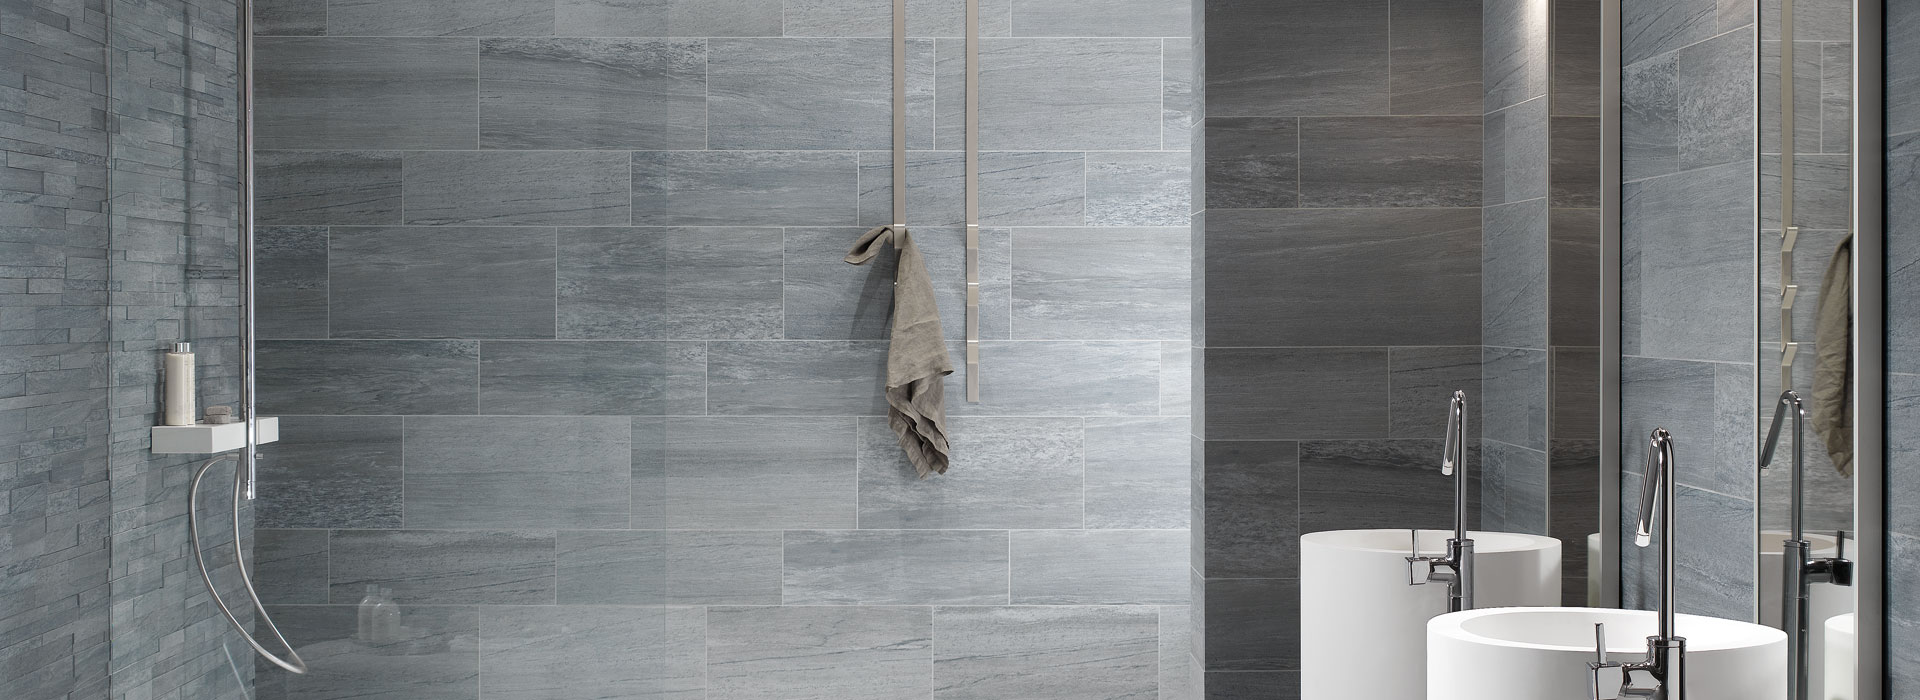 Dt Stone Floor Amp Wall Tiles Stone Flooring Amp Patio Paving Slabs Uk